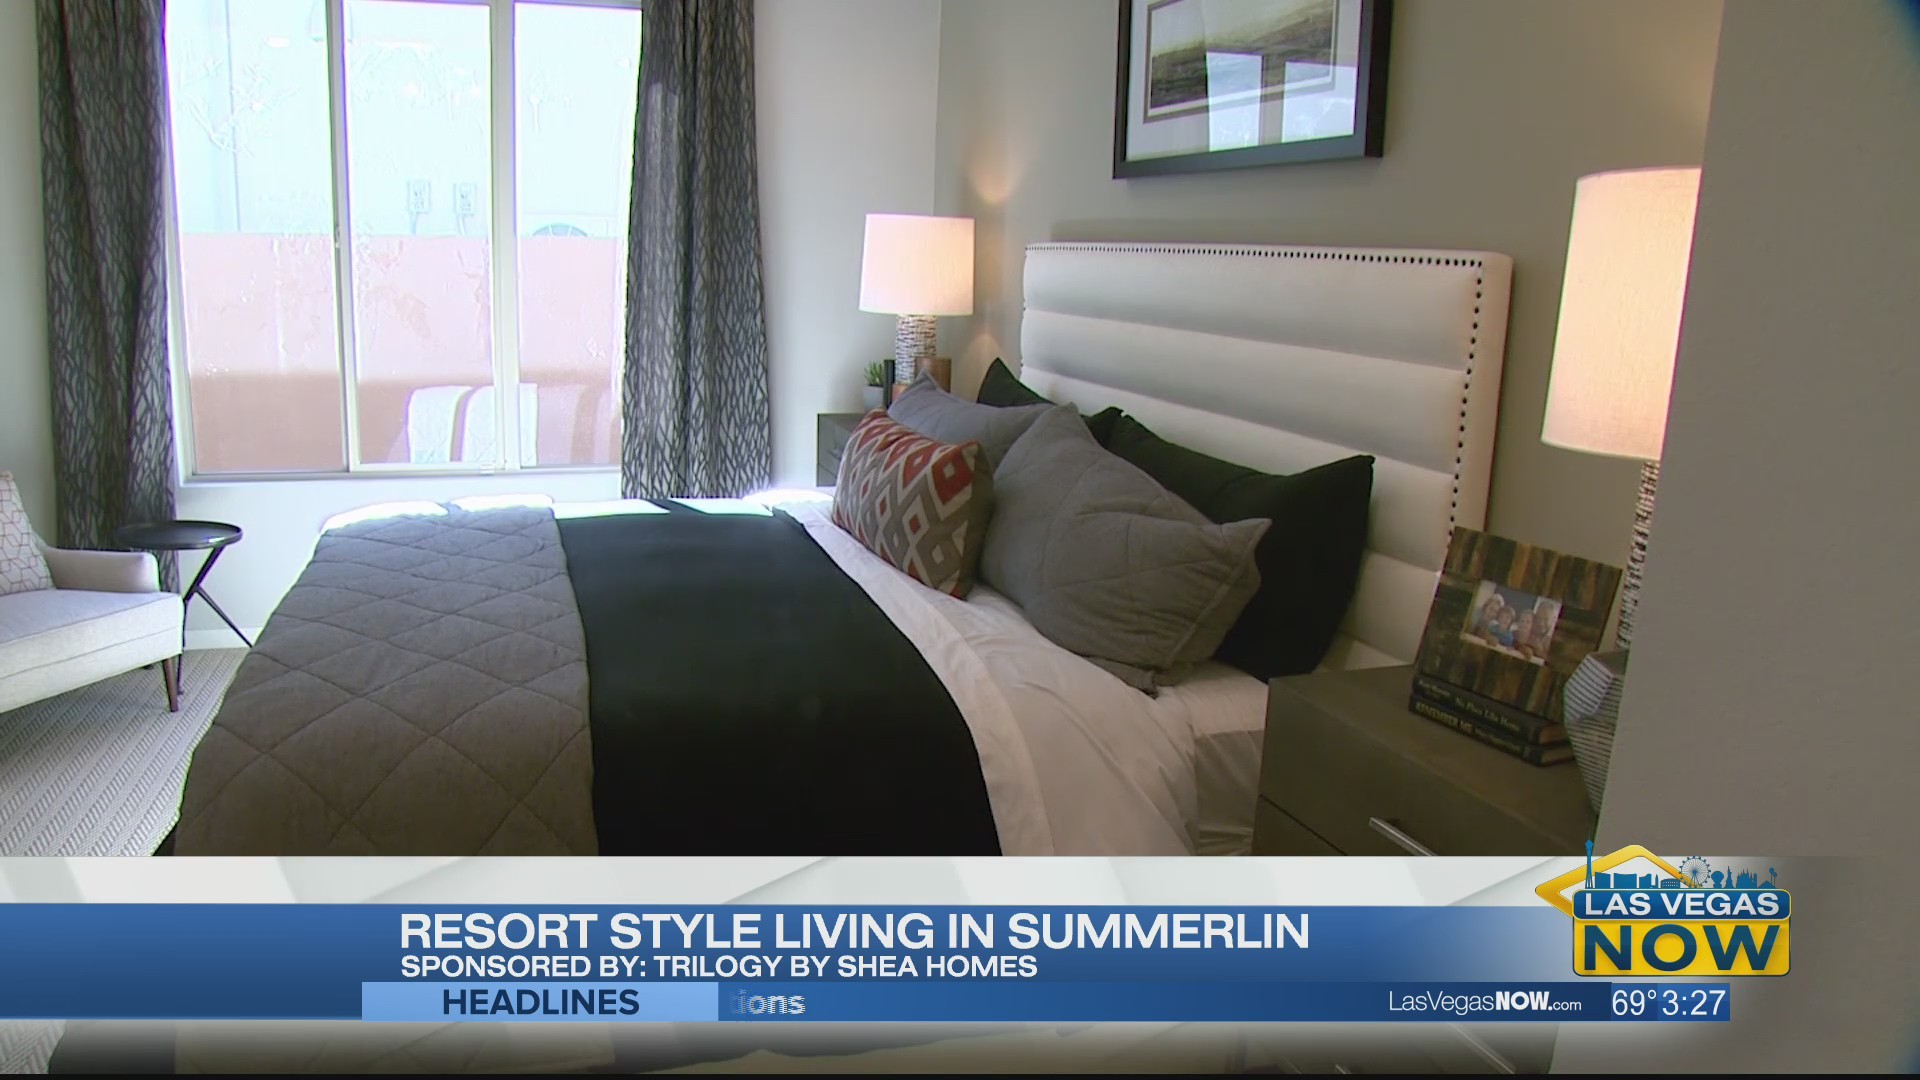 Resort style living in Summerlin